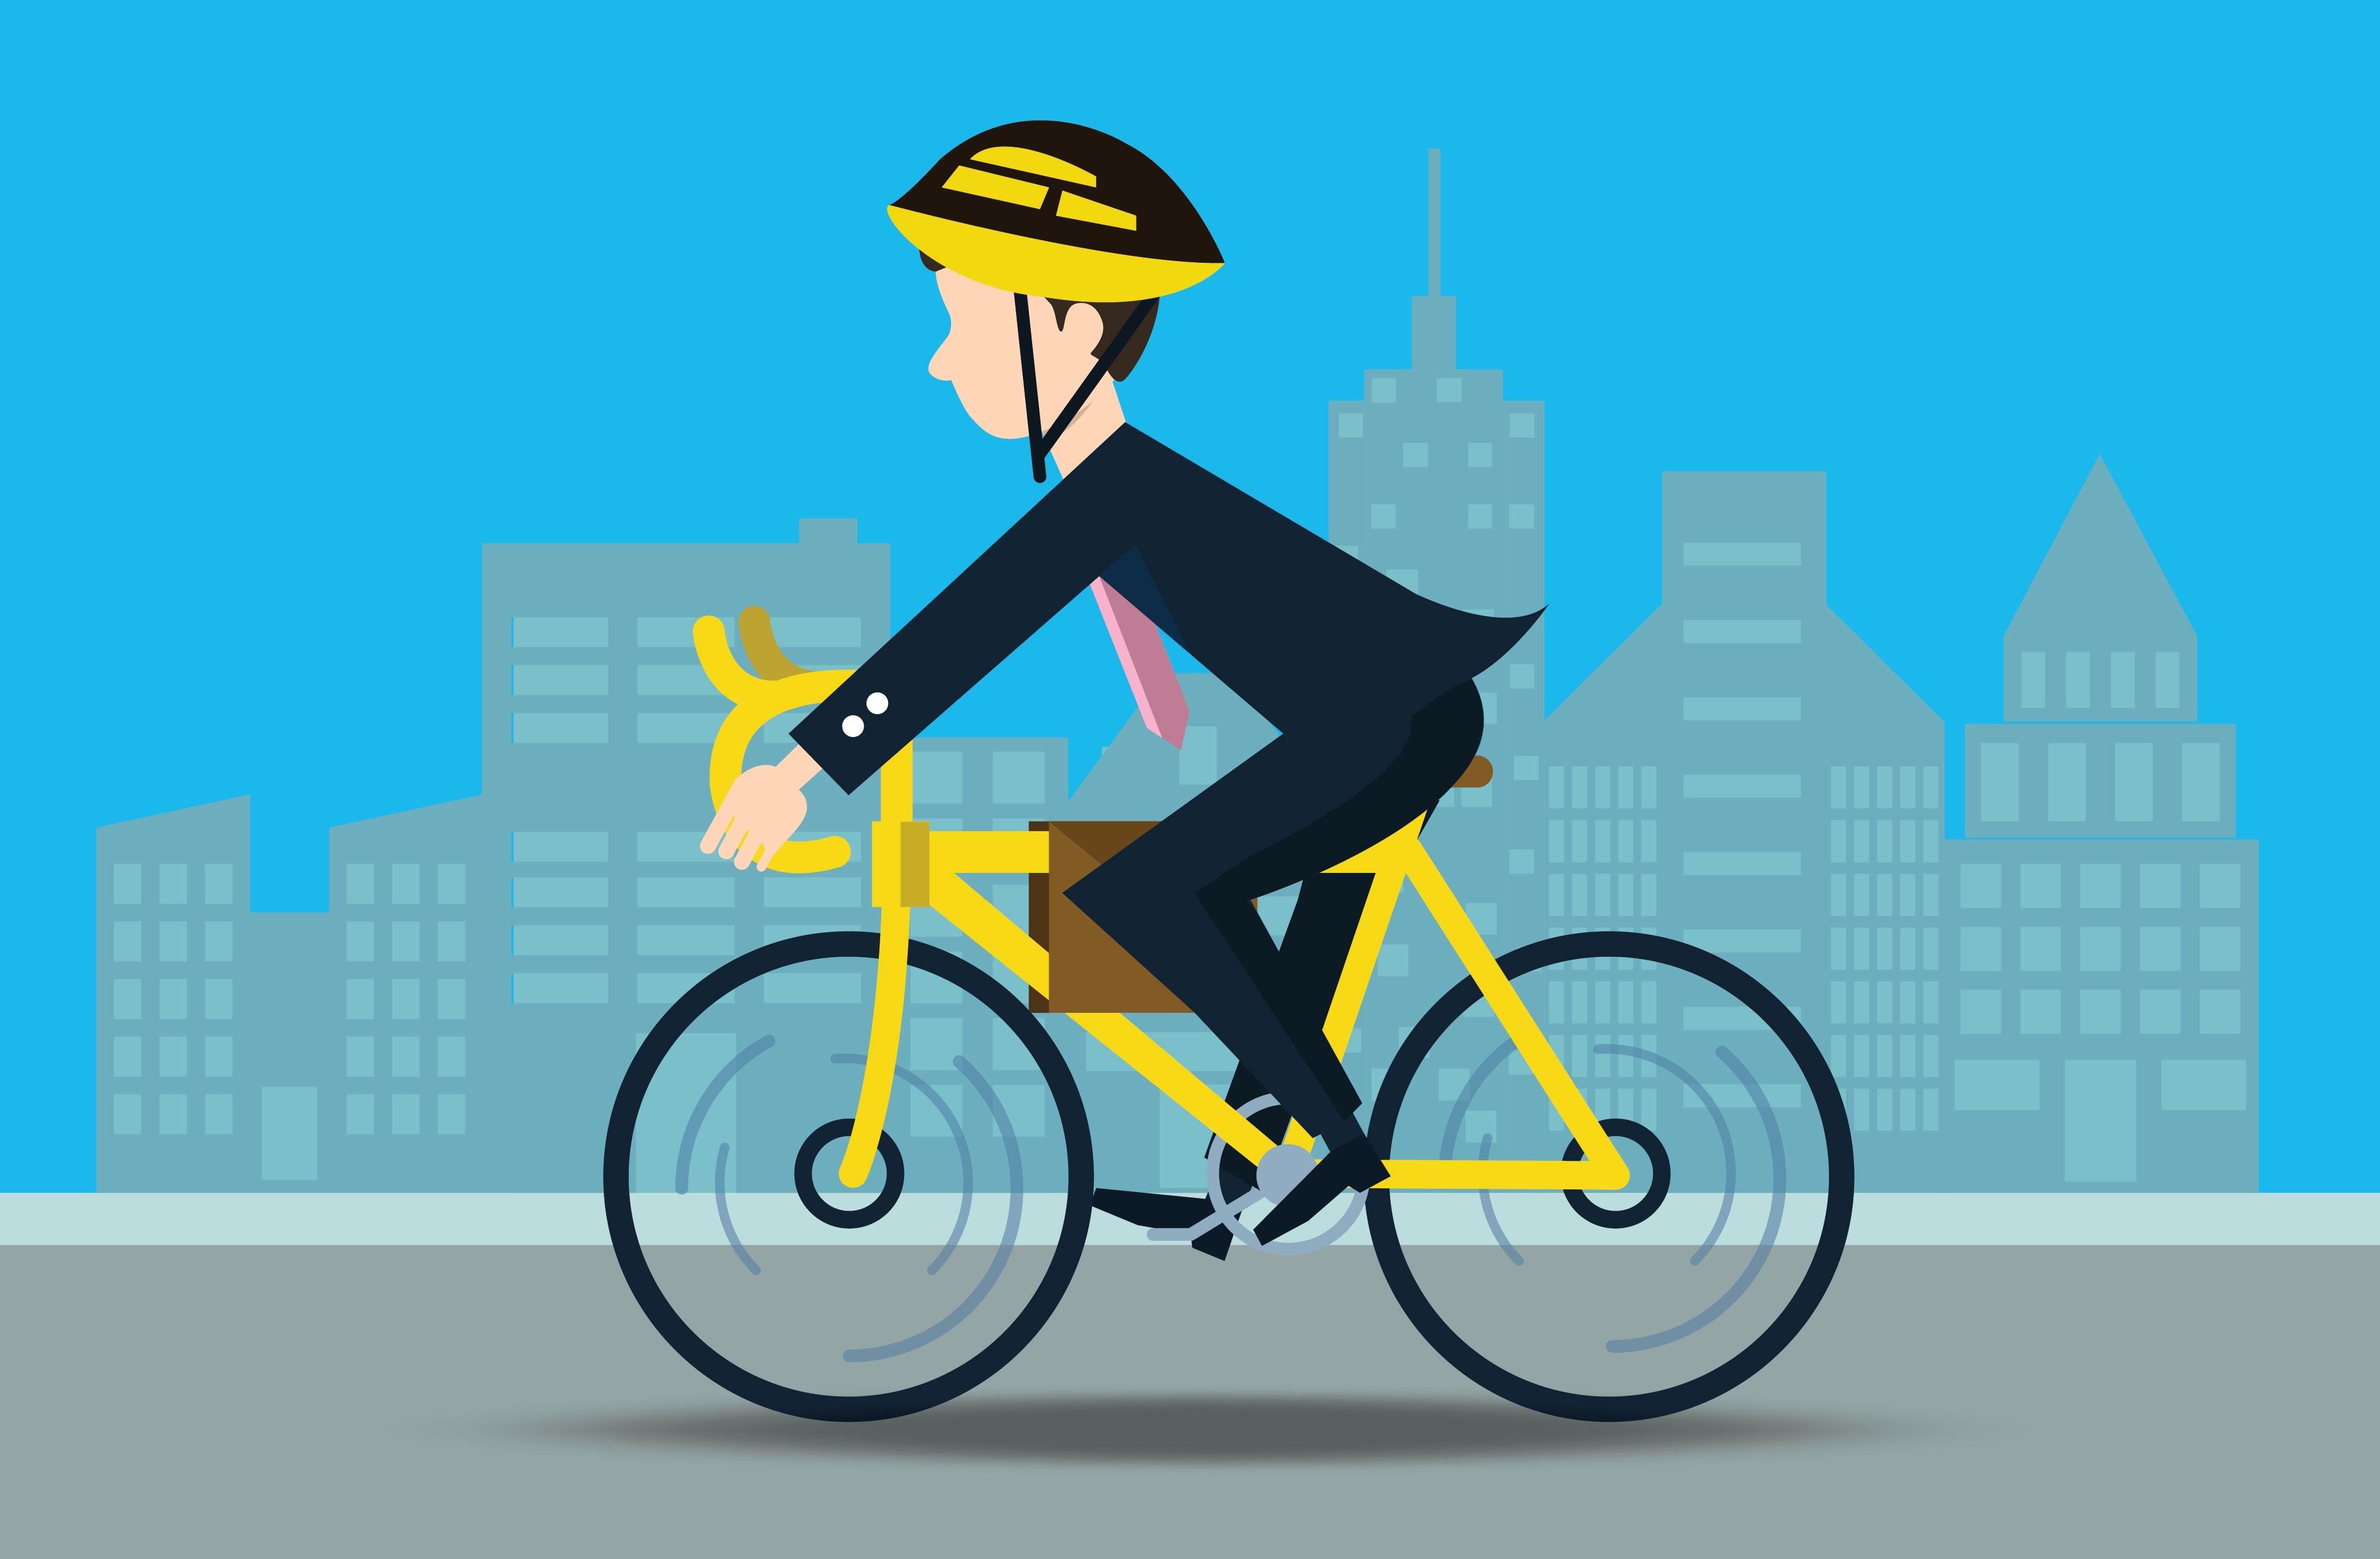 08.24.16-Put-Helmet-on-Your-Financial-Institutions-Vendor-Management-FEATURED.jpg